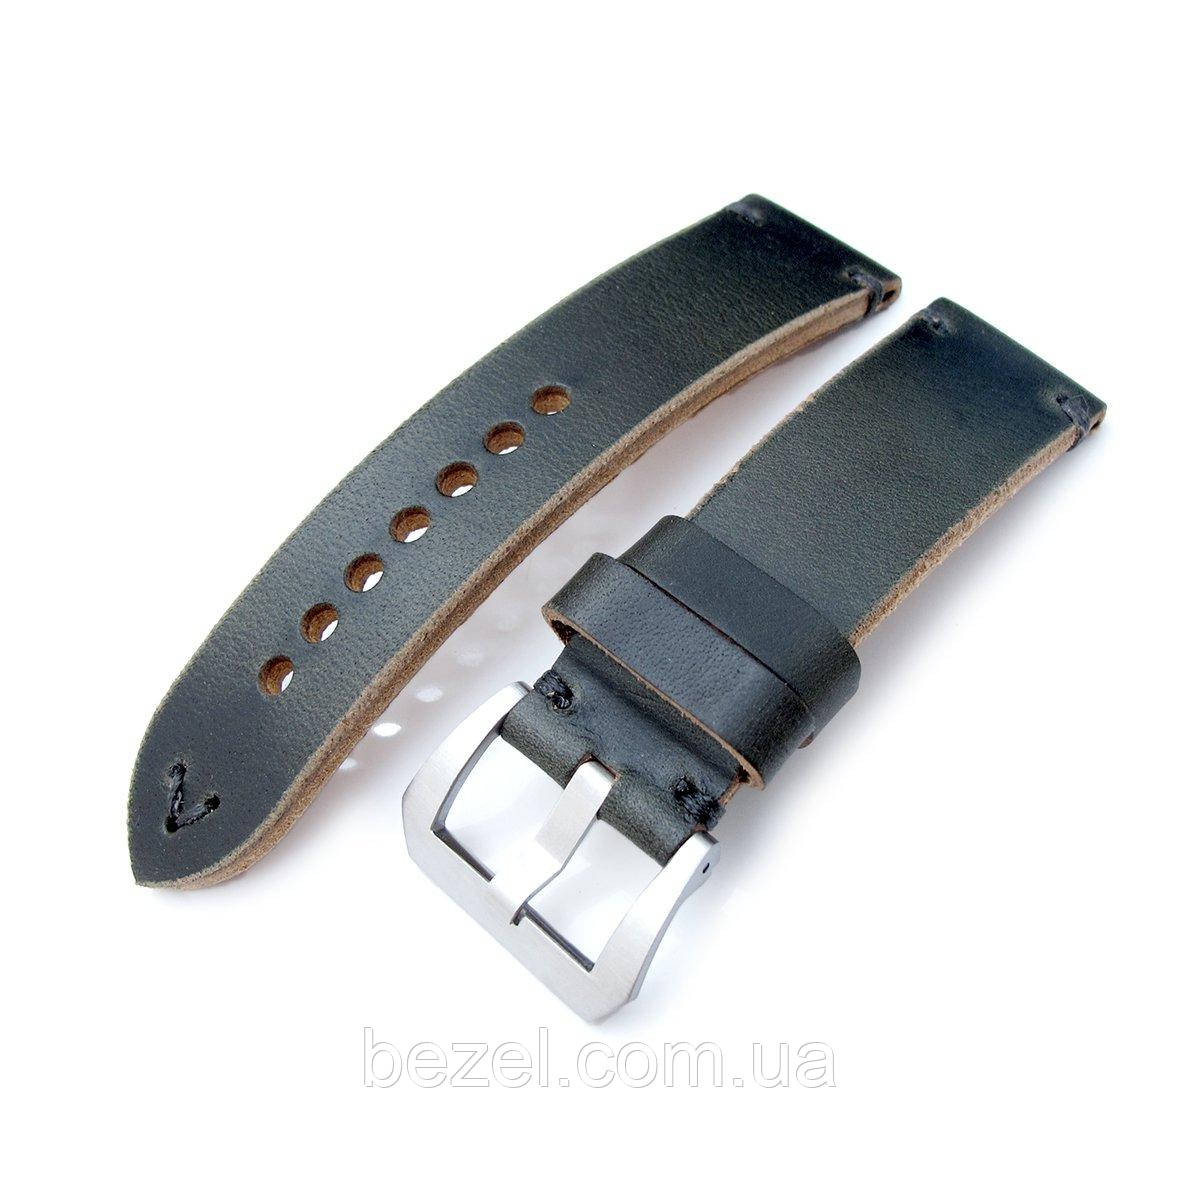 24mm MiLTAT Horween Chromexcel Watch Strap, Blackish Green, Grey Stitching